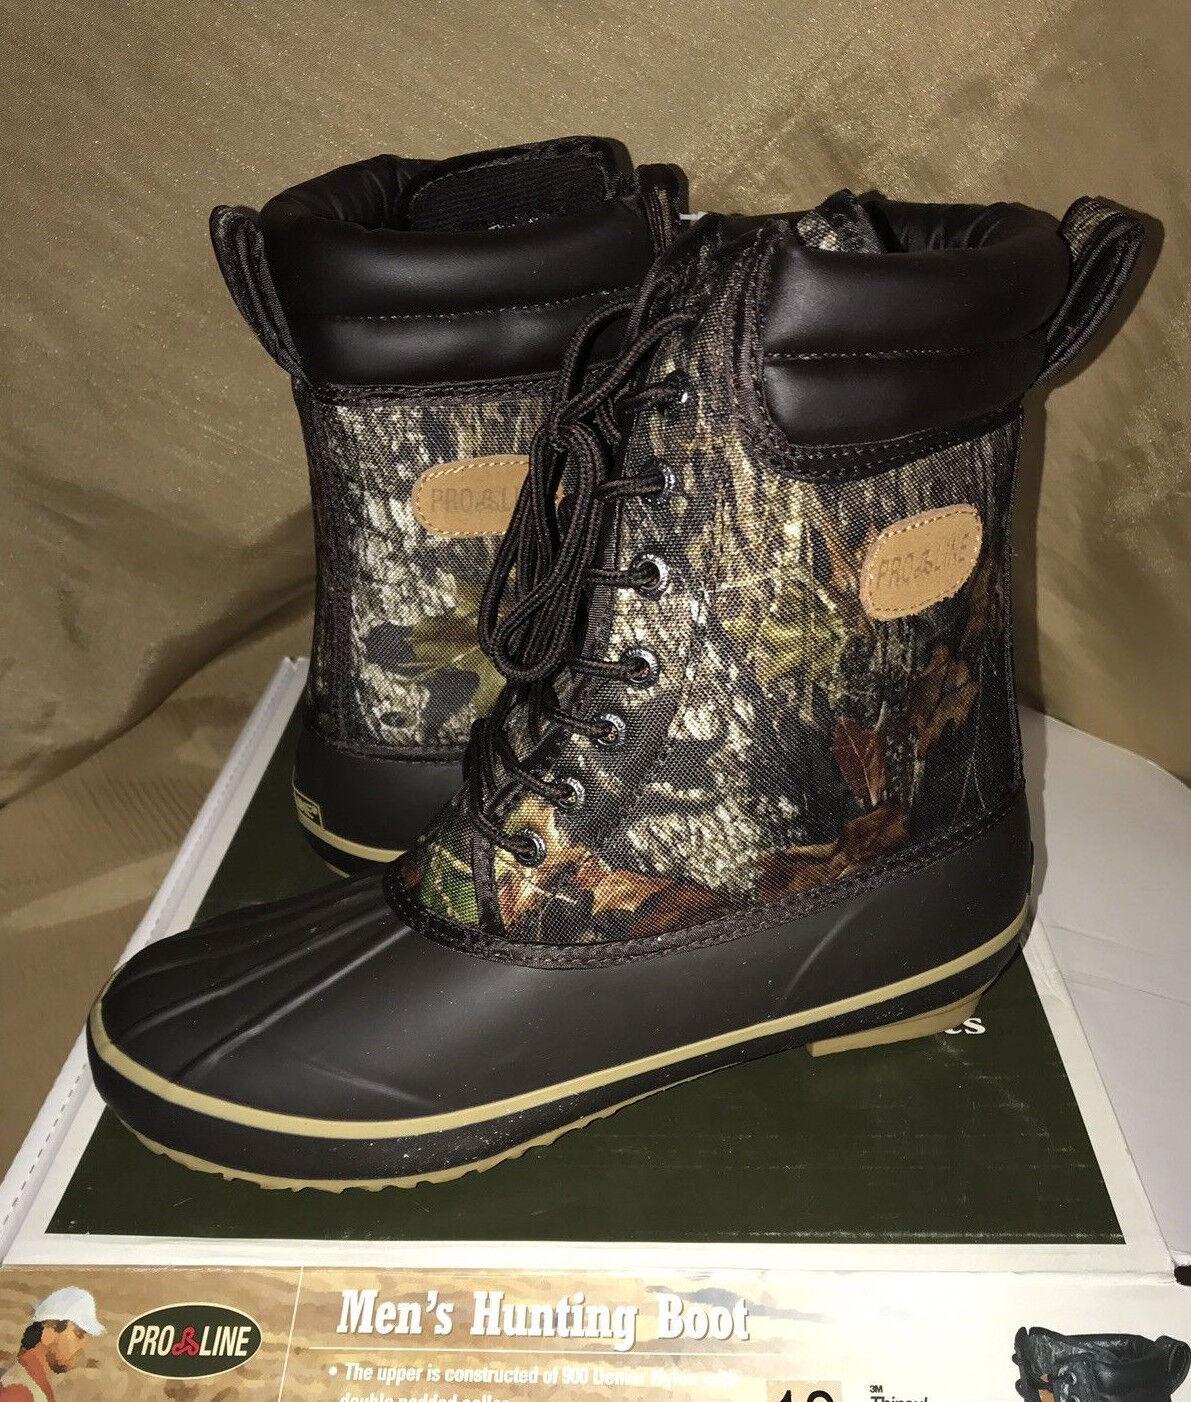 10  Pro-Line Boots WATERPROOF Mens Size  13 Hunting Boots 200g Mossy Oak Camo  online sale